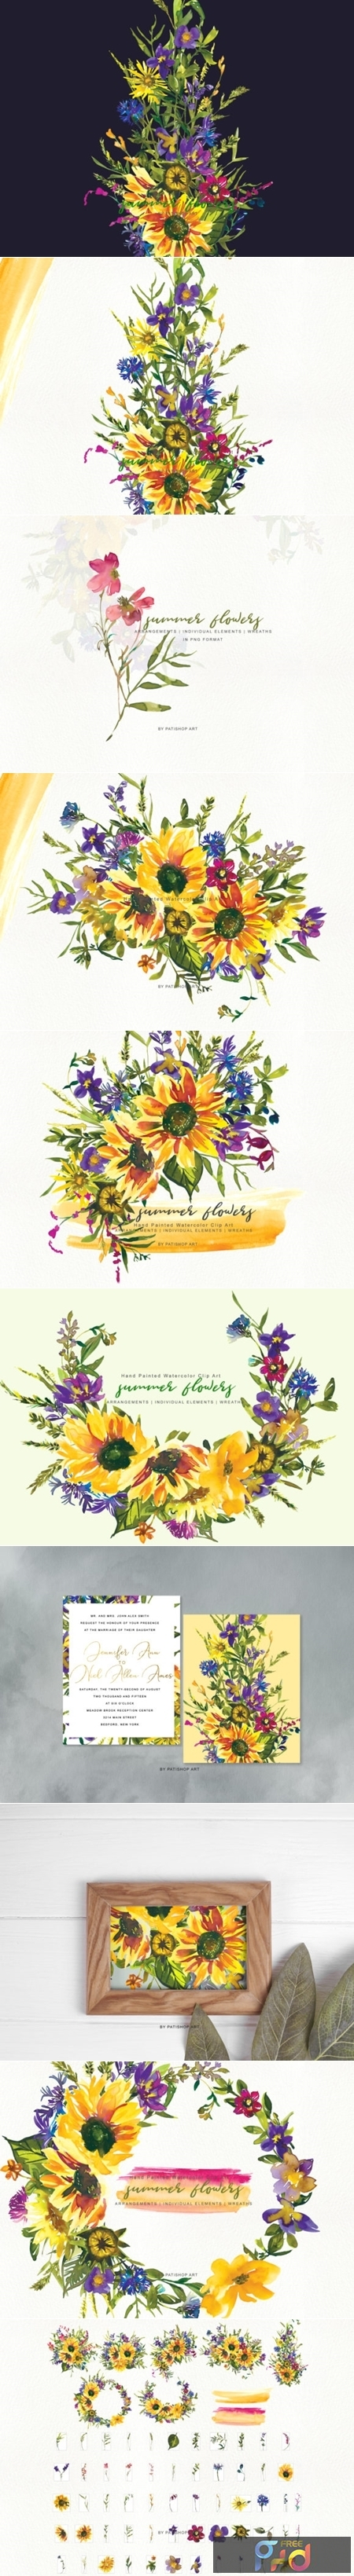 Watercolor Sunflower Wildflower Clipart 1505794.